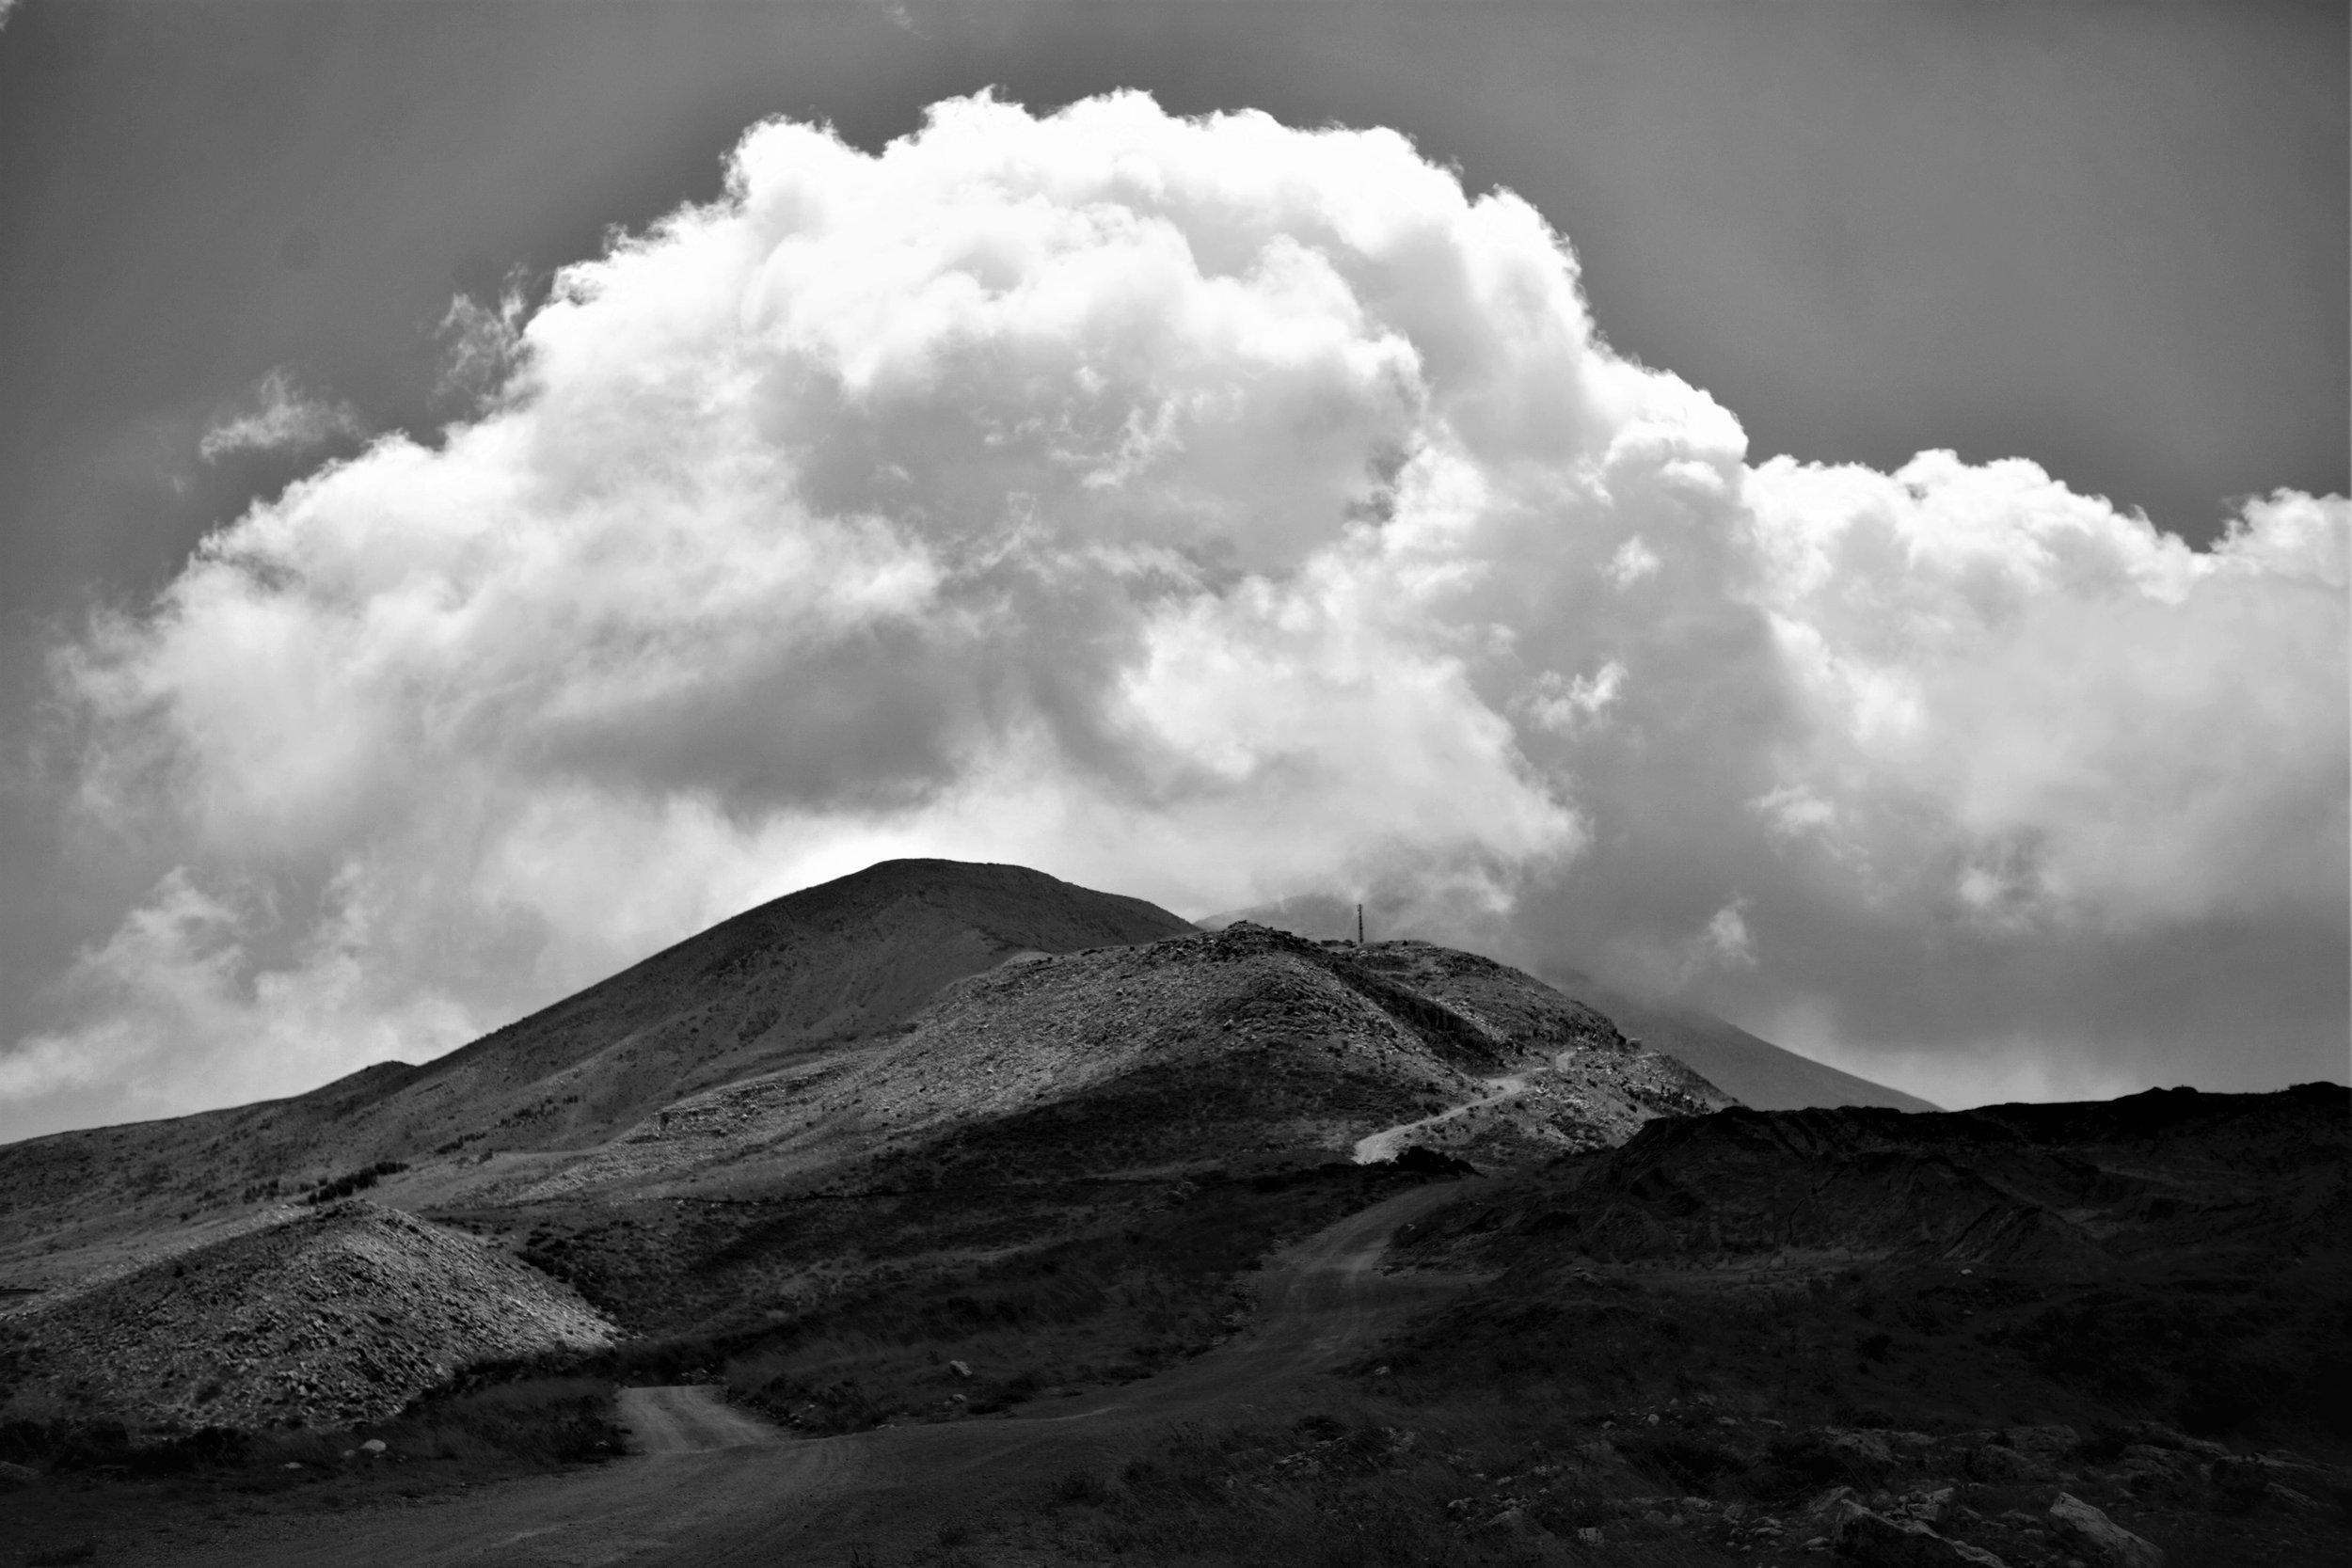 Bergkette am Mount Lebanon mit feuchter Meeresluft.